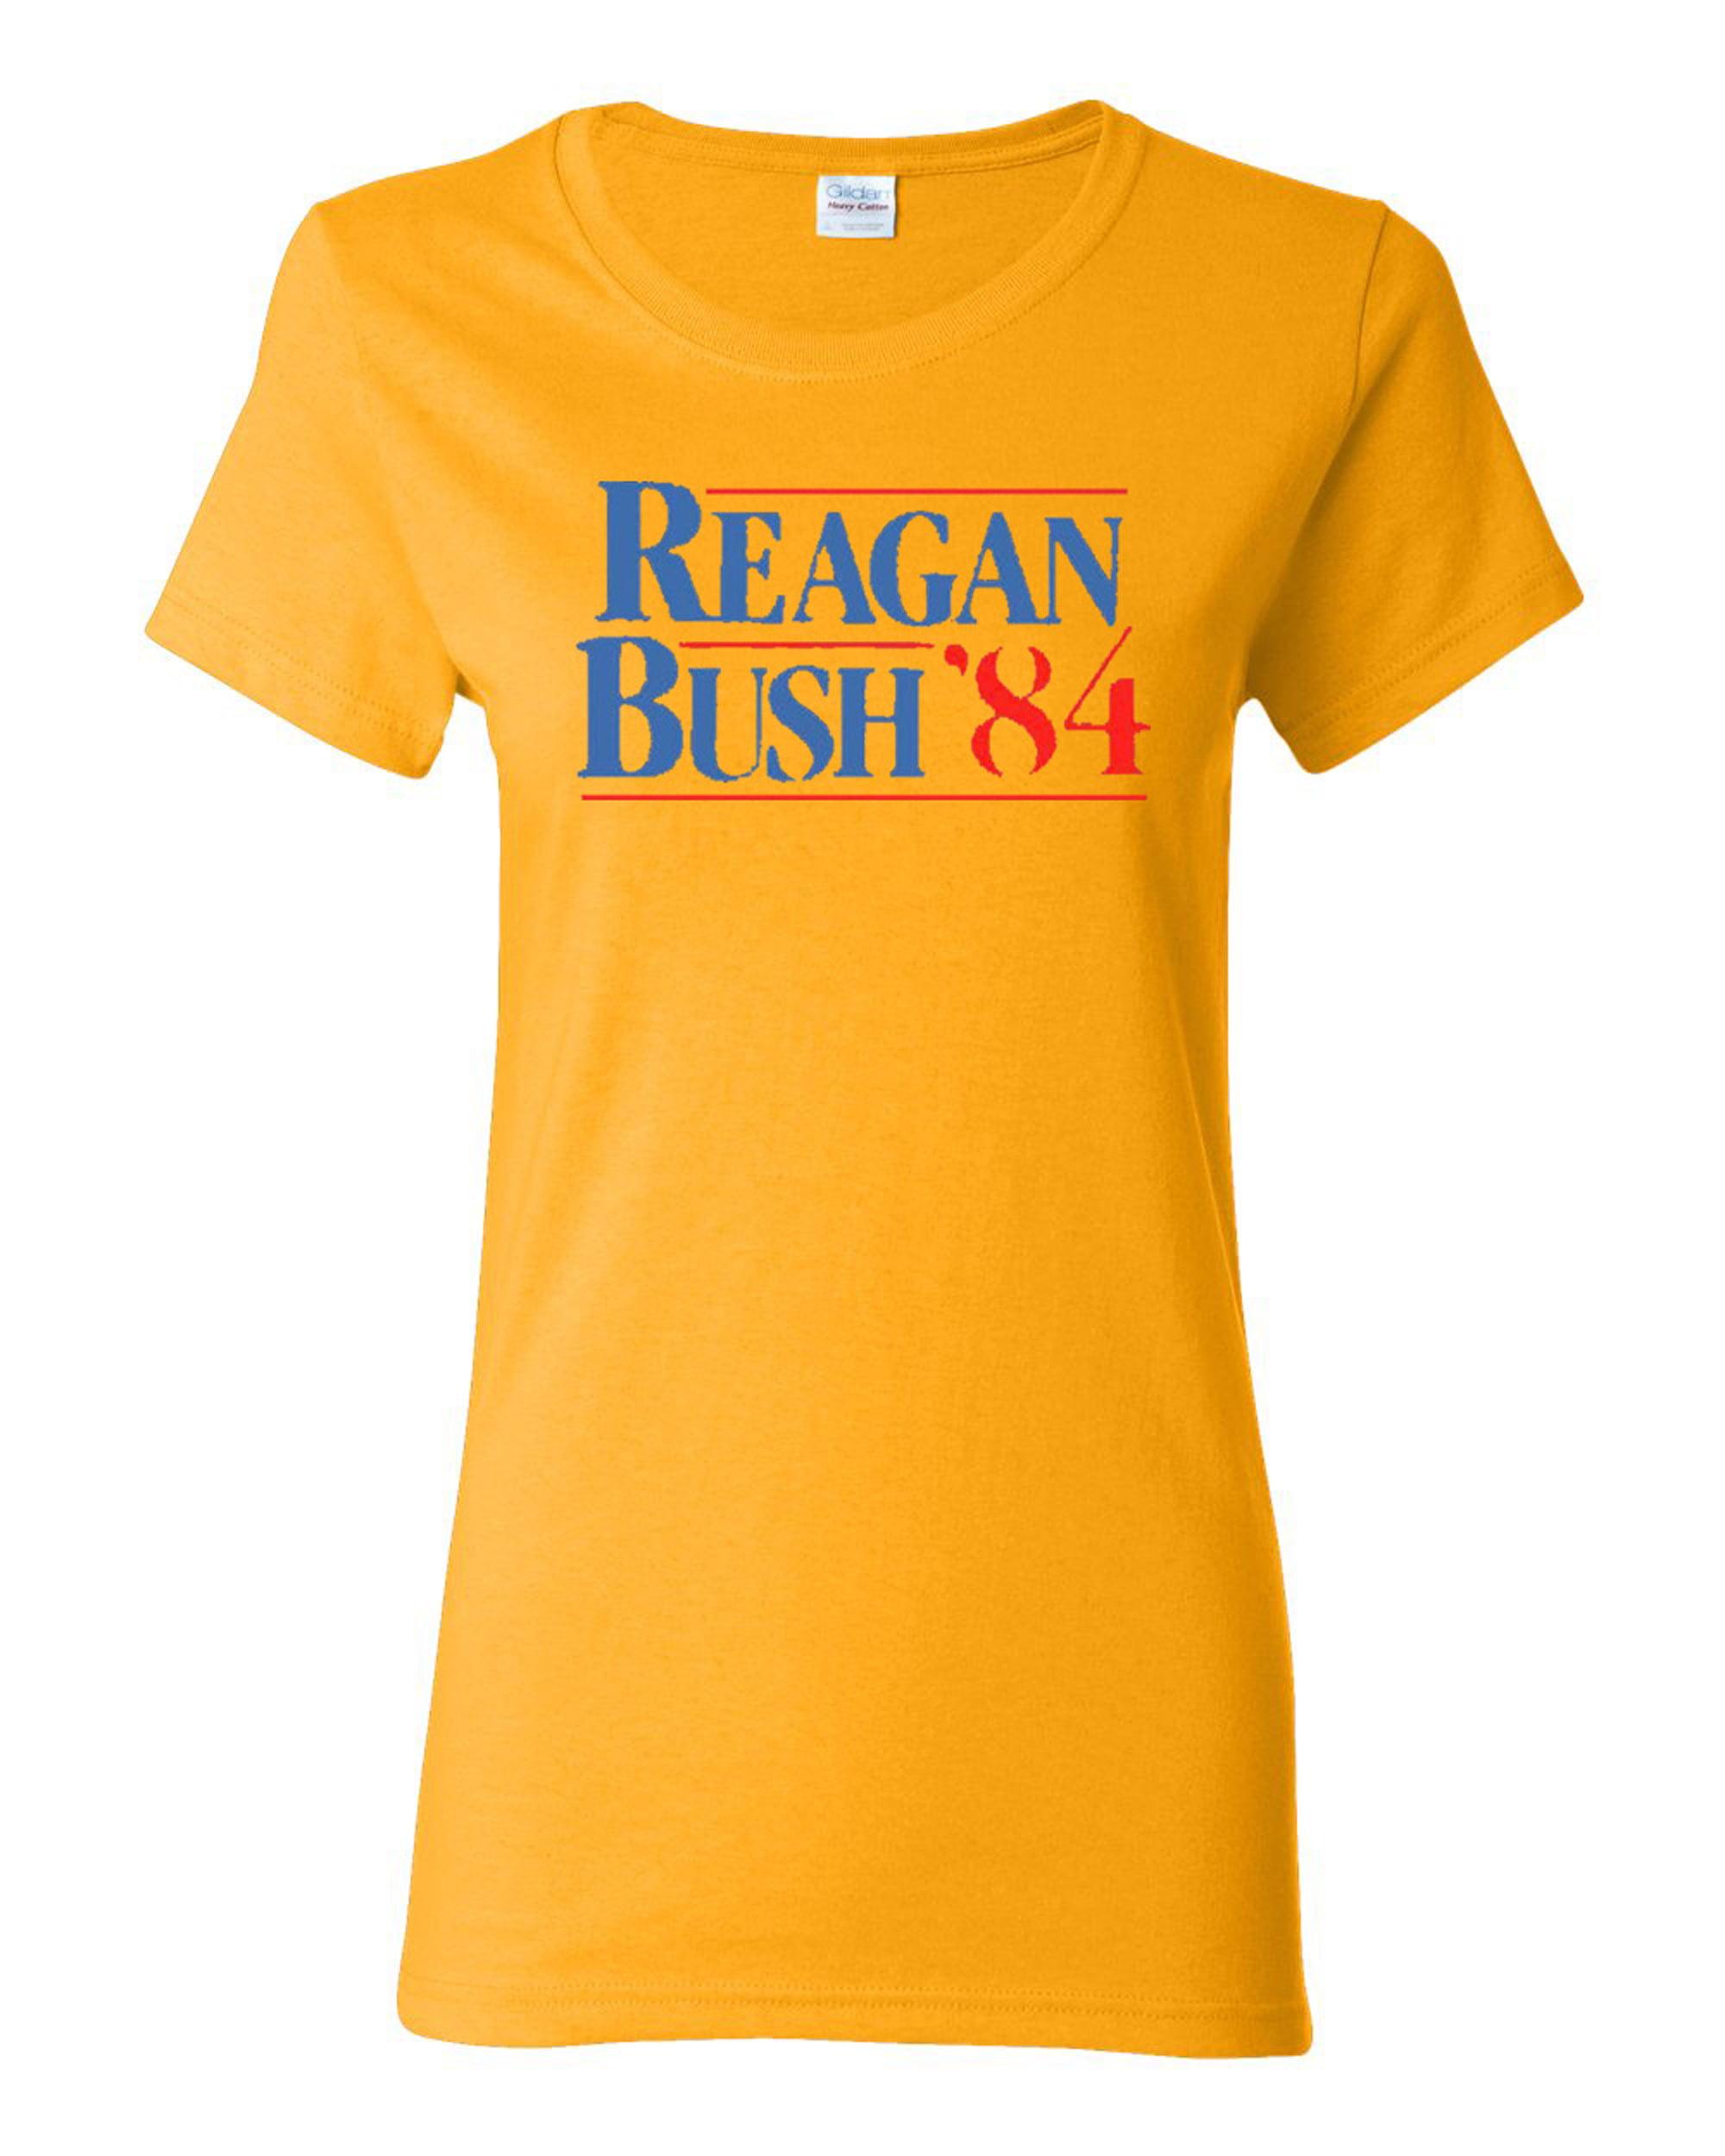 Ladies Reagan Bush 84 T-Shirt Tee